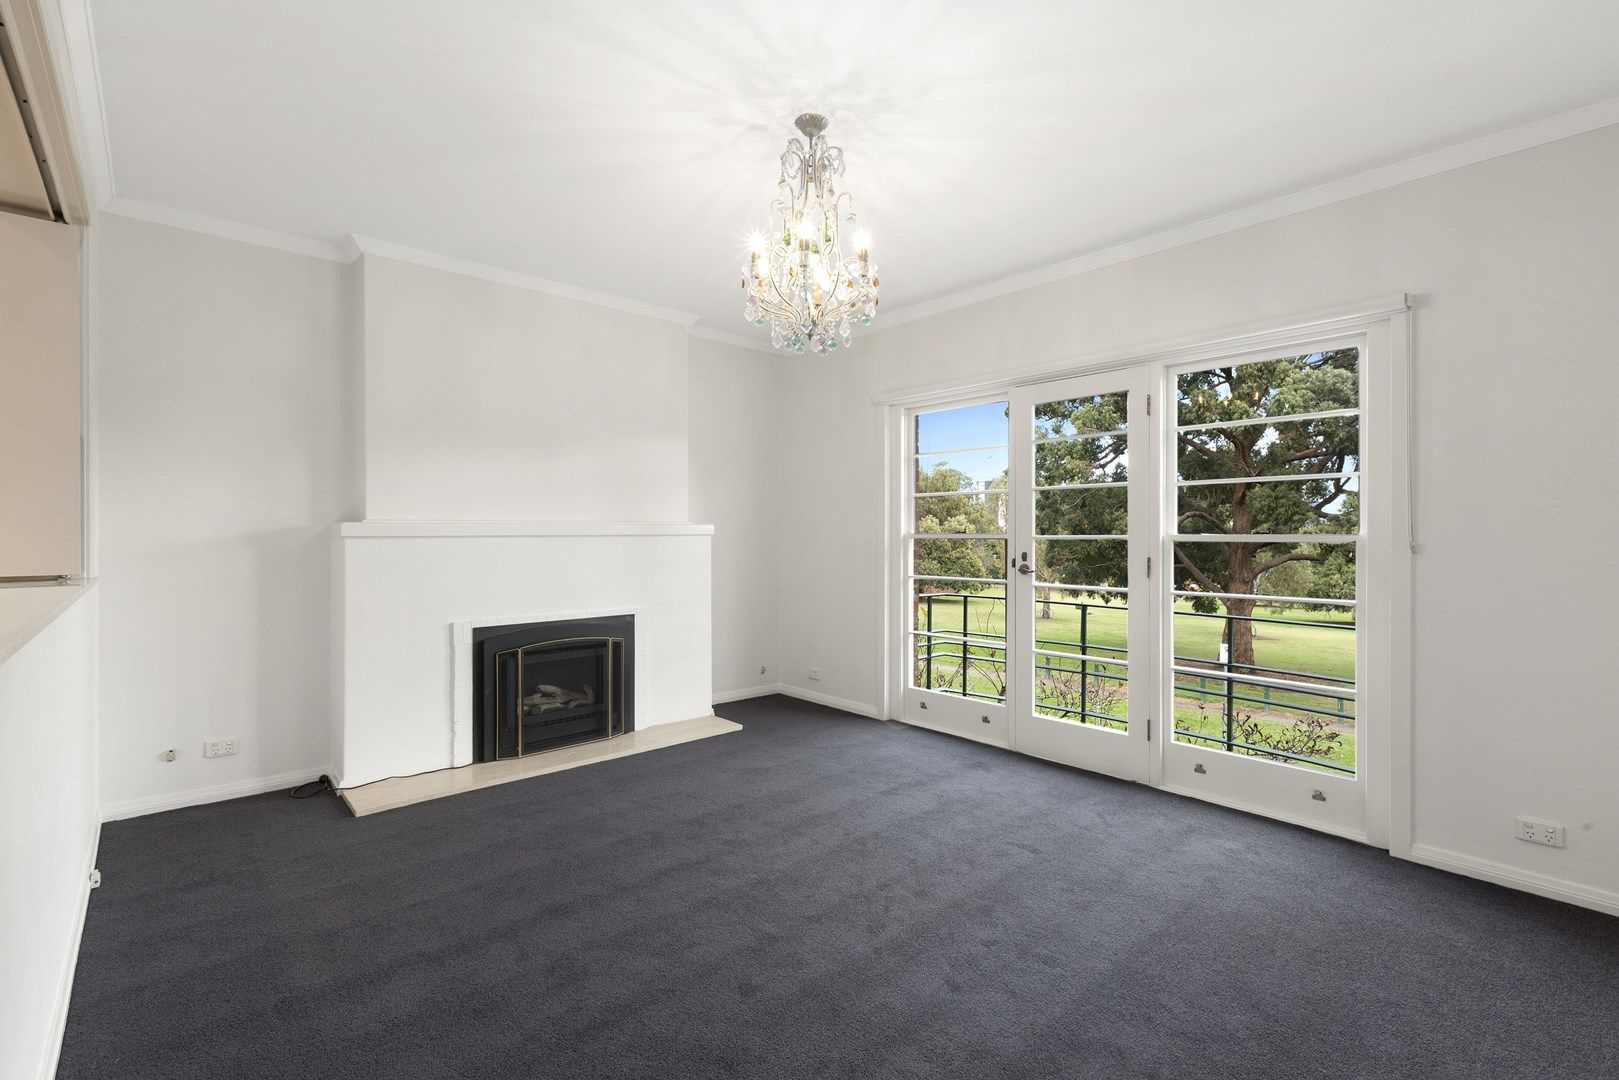 13/98 Vale Street, East Melbourne VIC 3002, Image 0